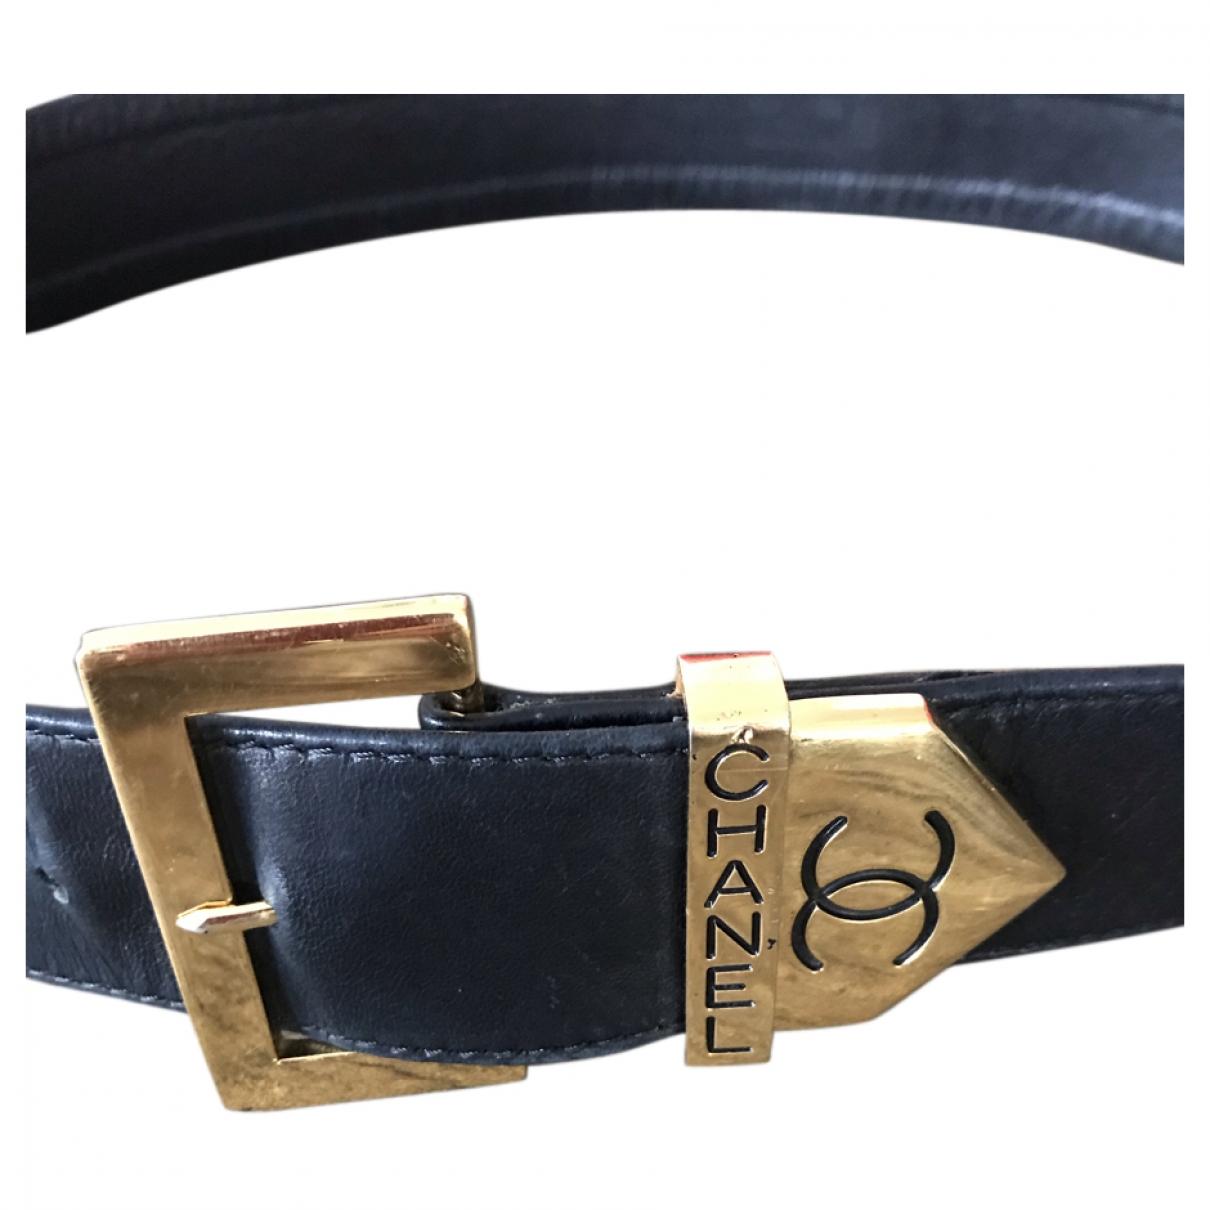 Chanel \N Black Leather belt for Women S International